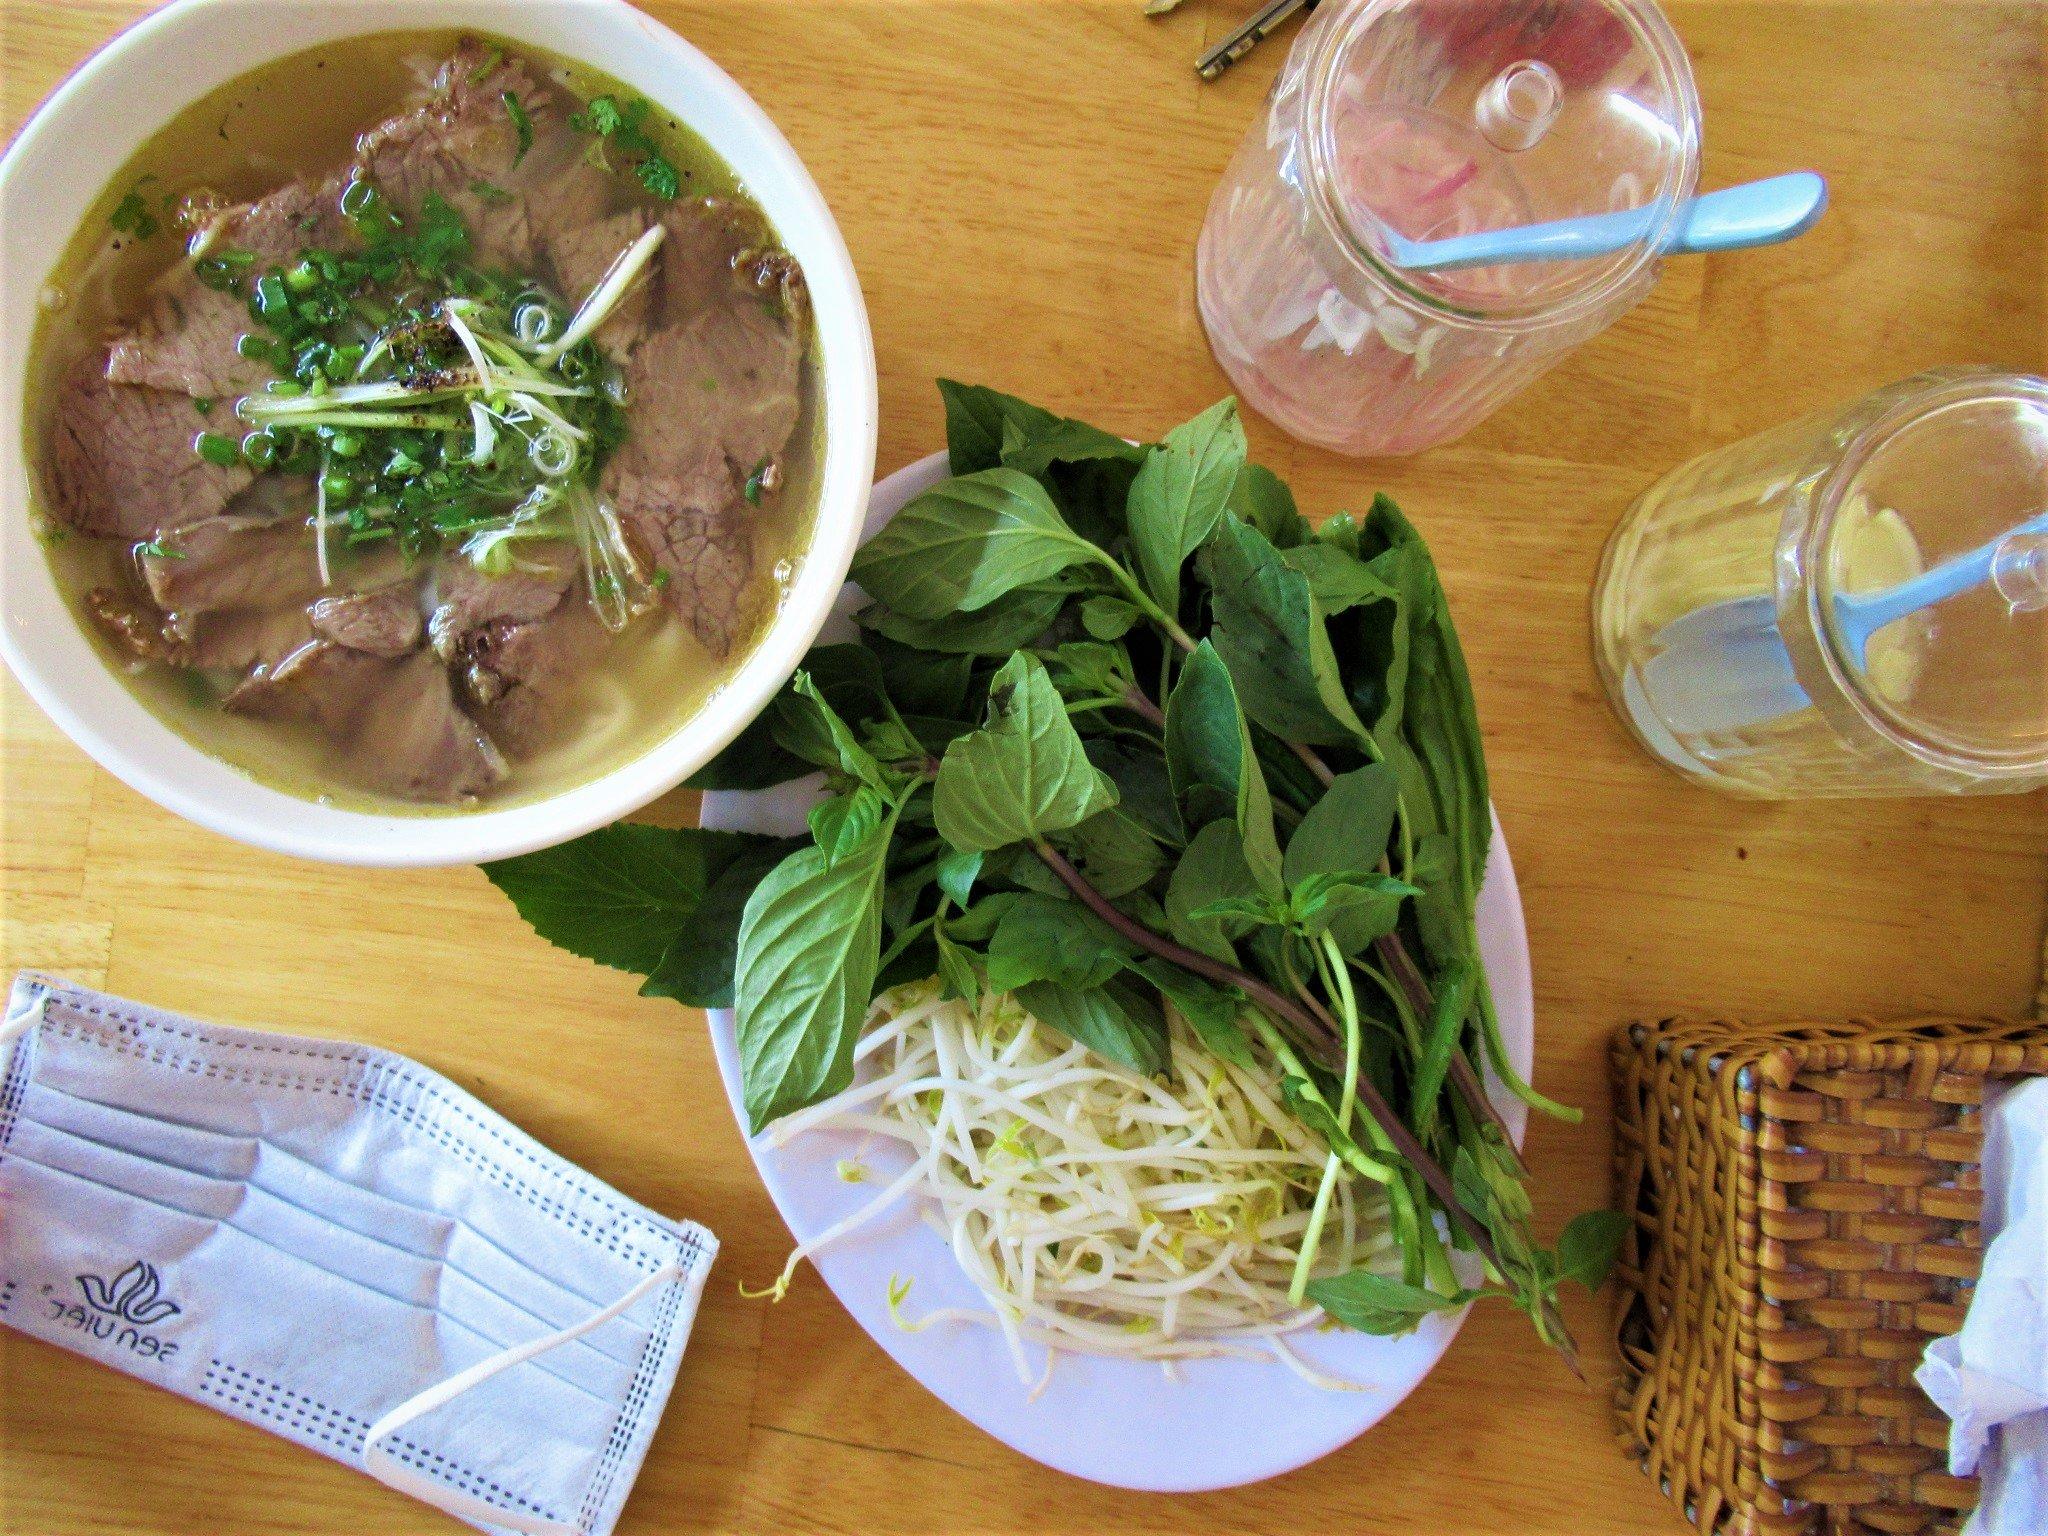 Phở bò, Vietnamese beef noodle soup